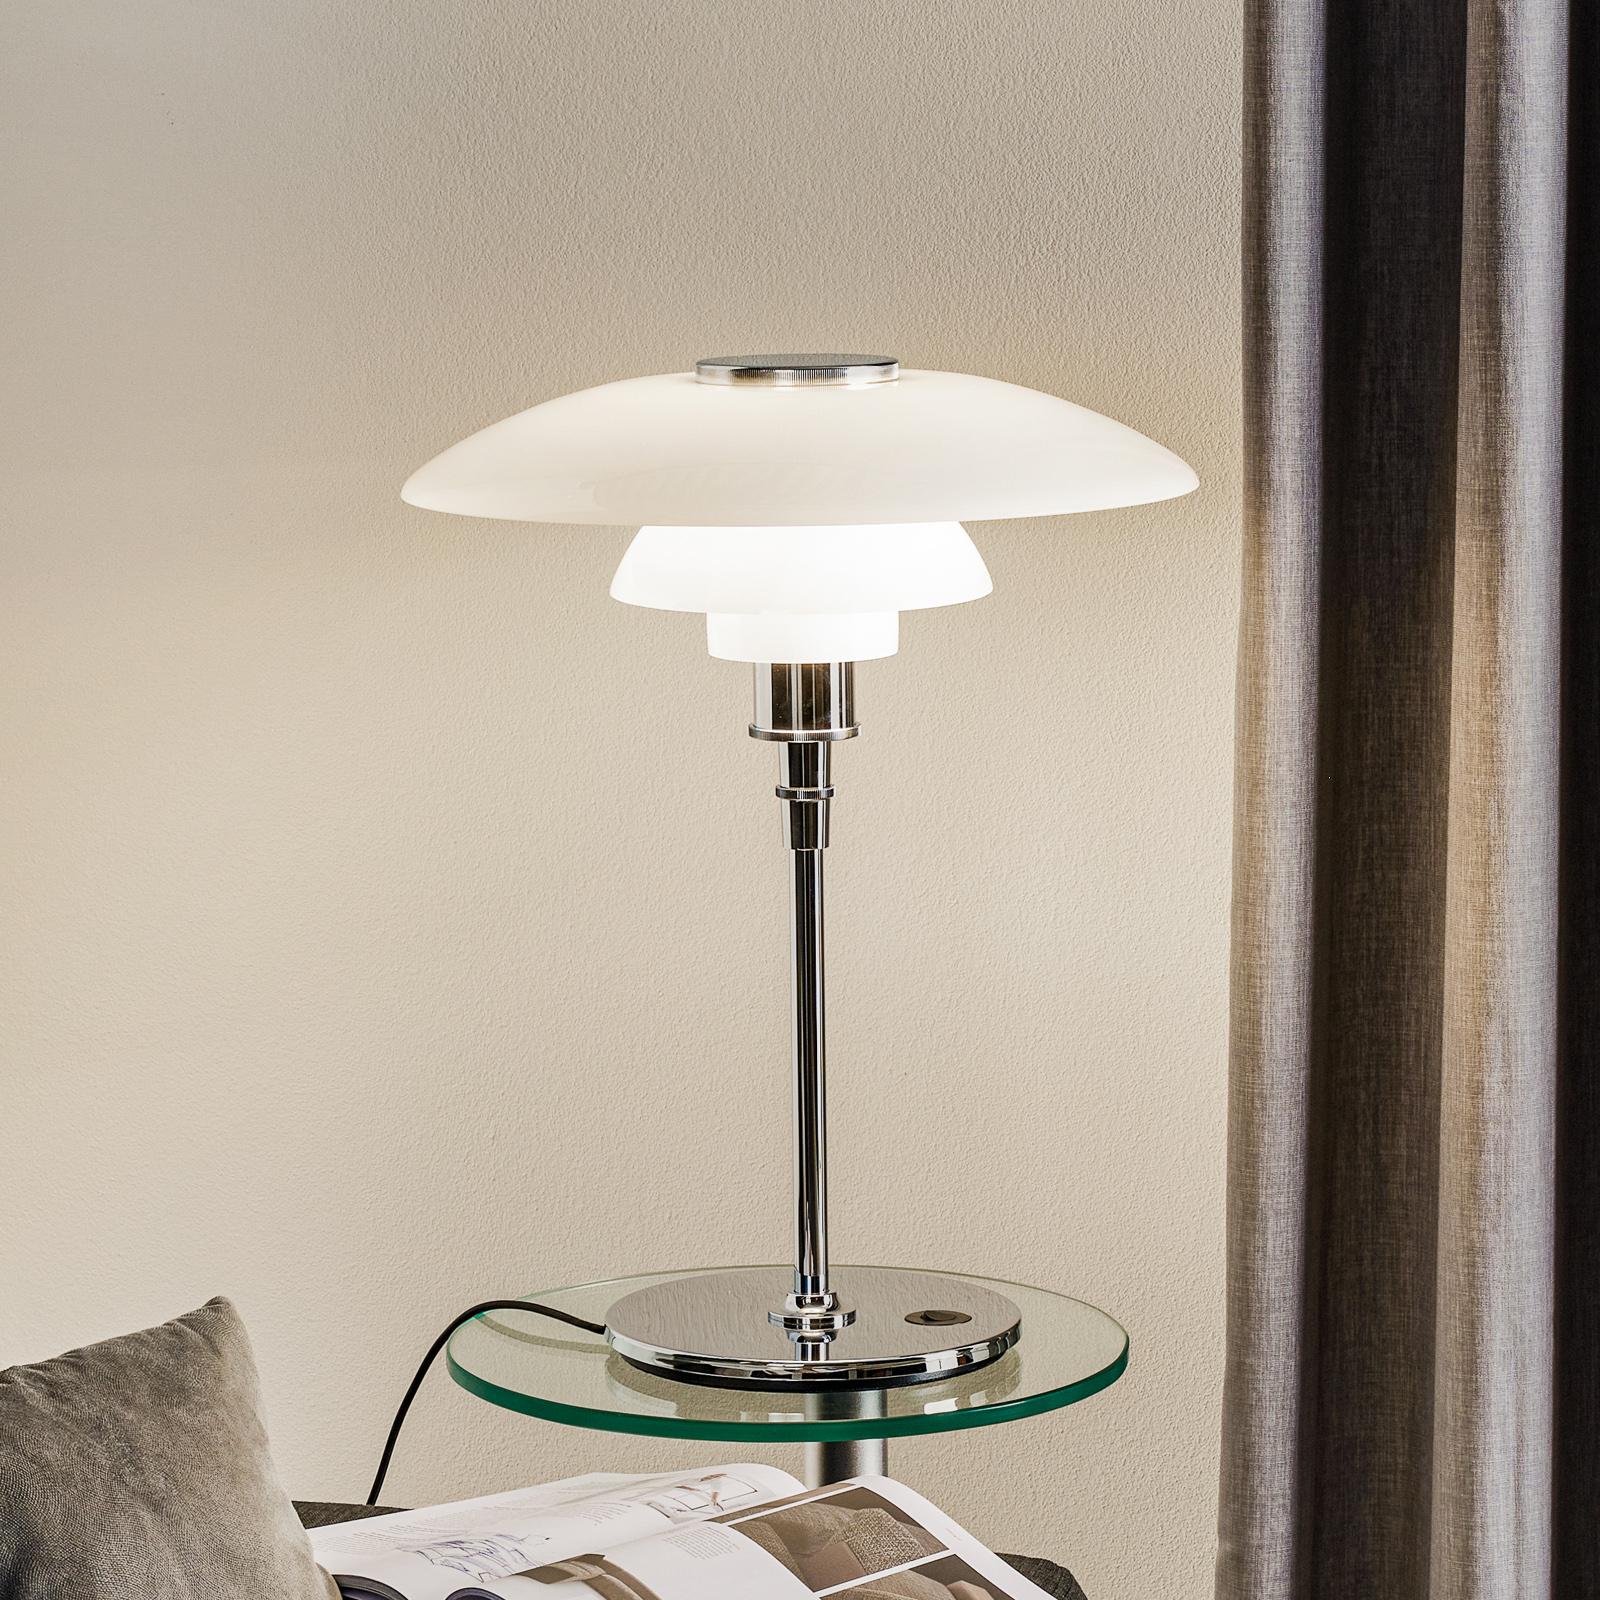 Louis Poulsen PH 4 1/2-3 1/2 tafellamp chroom/wit